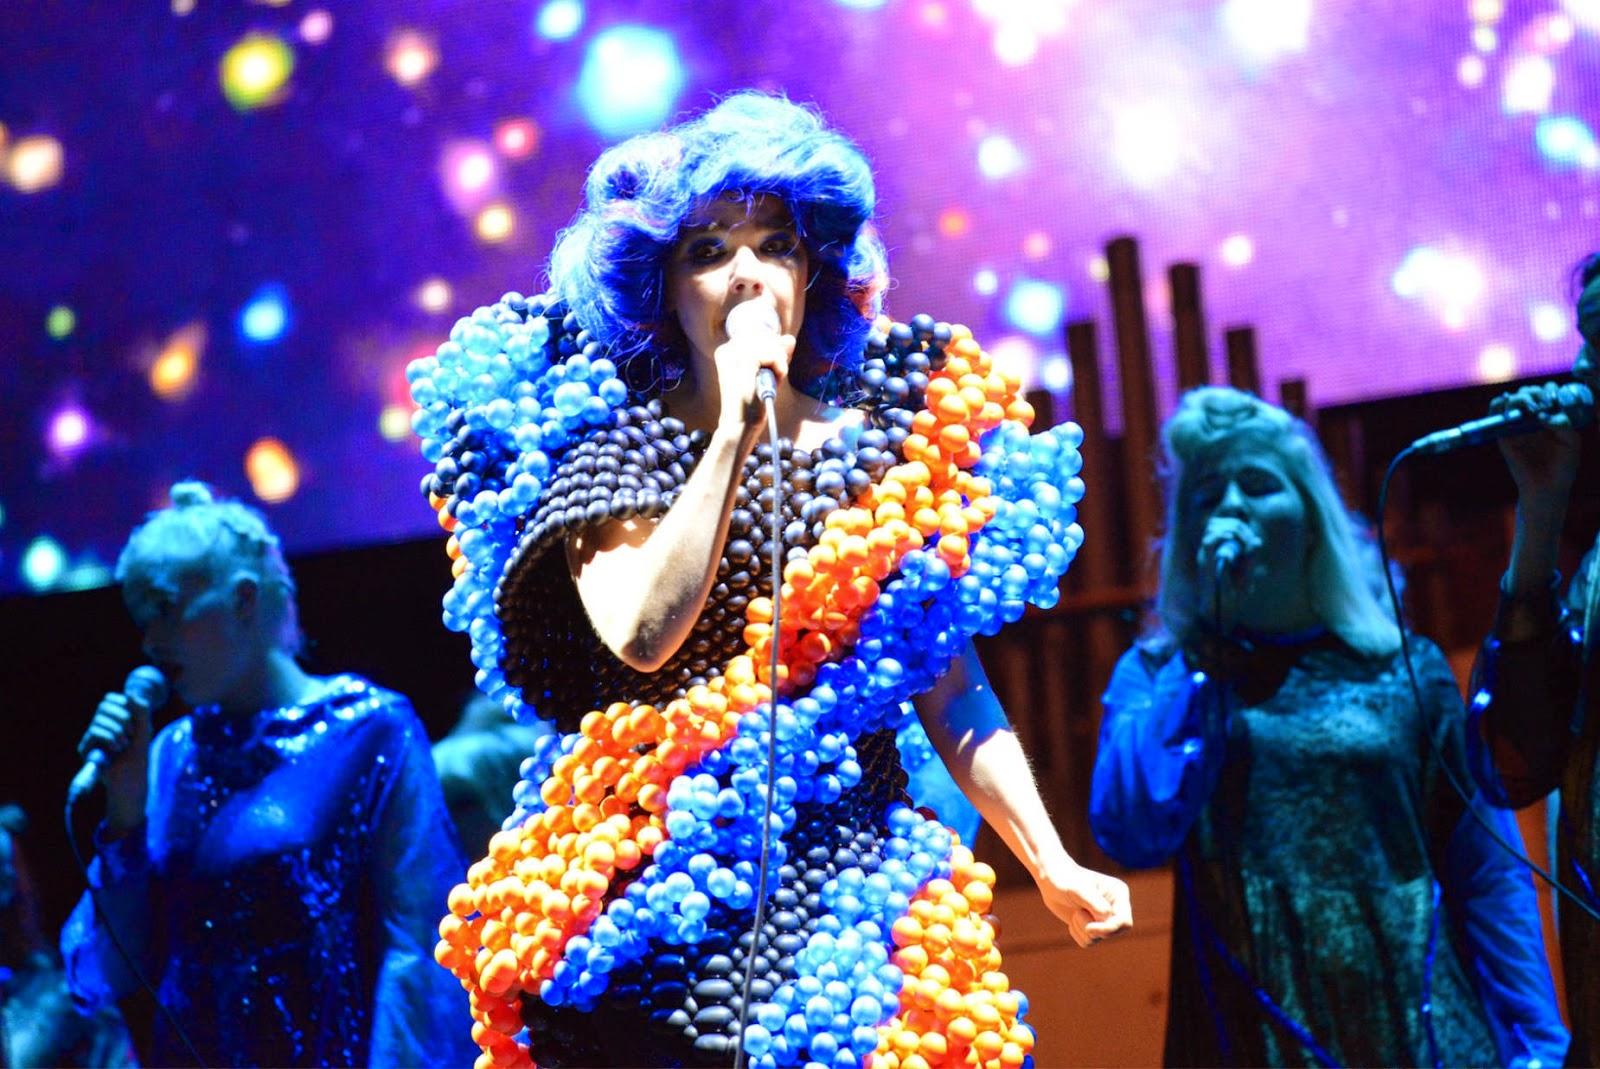 björk guðmundsdóttir: Björk - Live @ Fuji Rock Festival ...